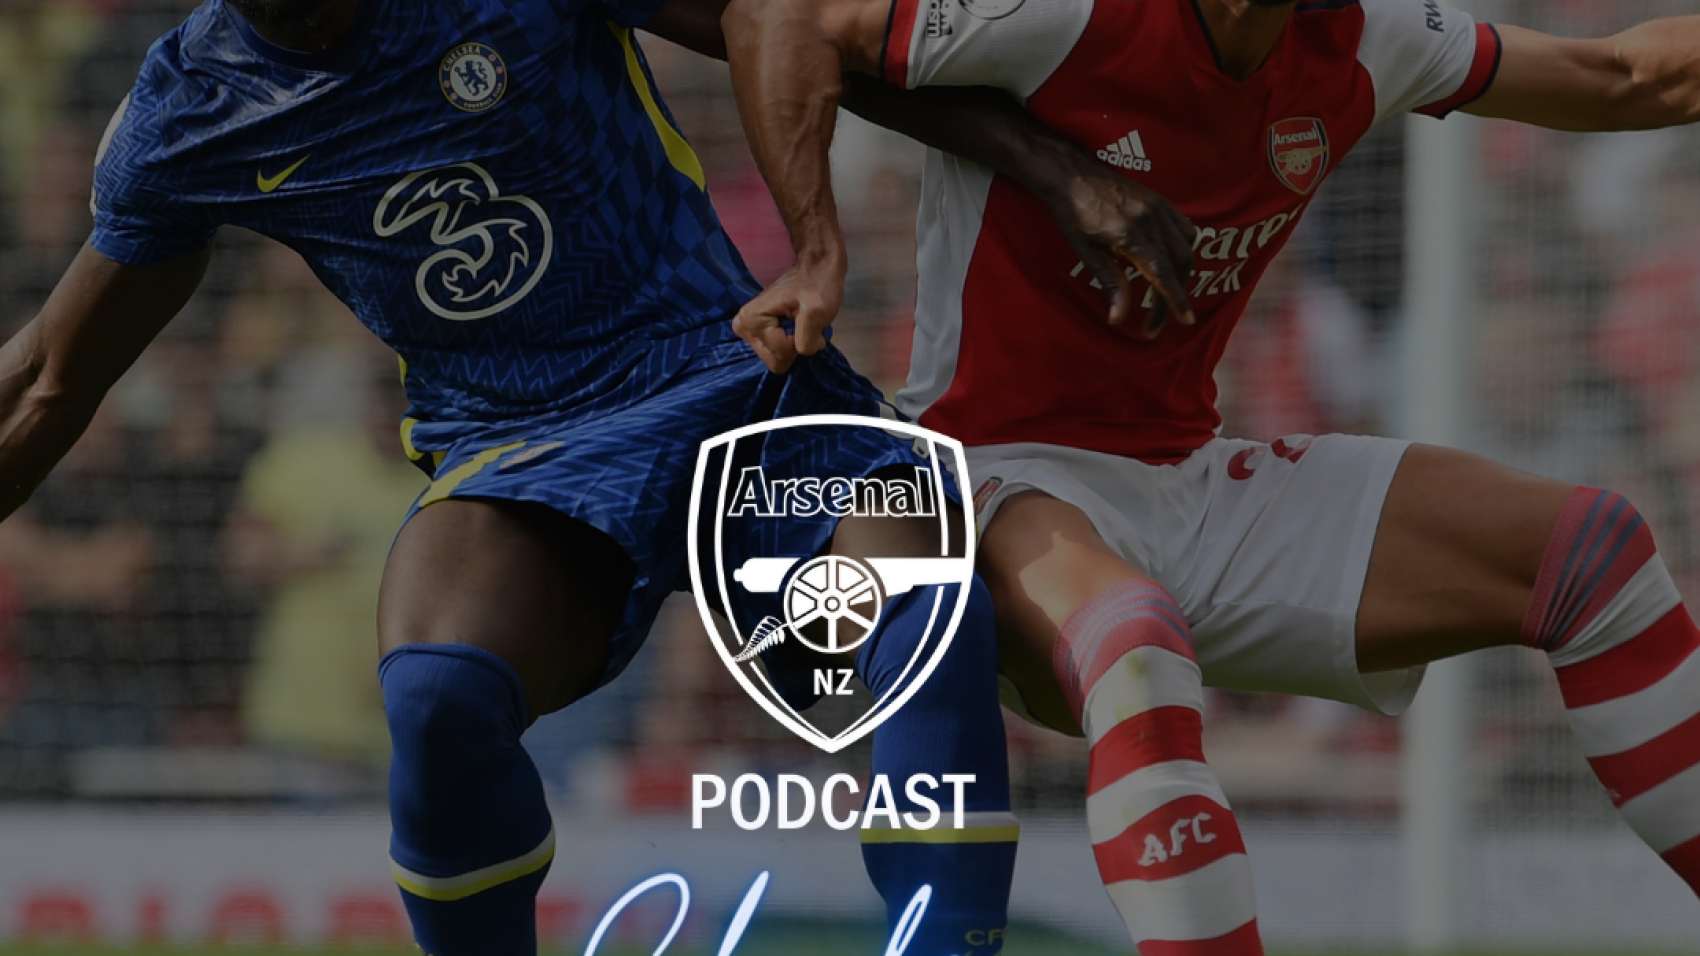 005 - Arsenal vs Chelsea - Review